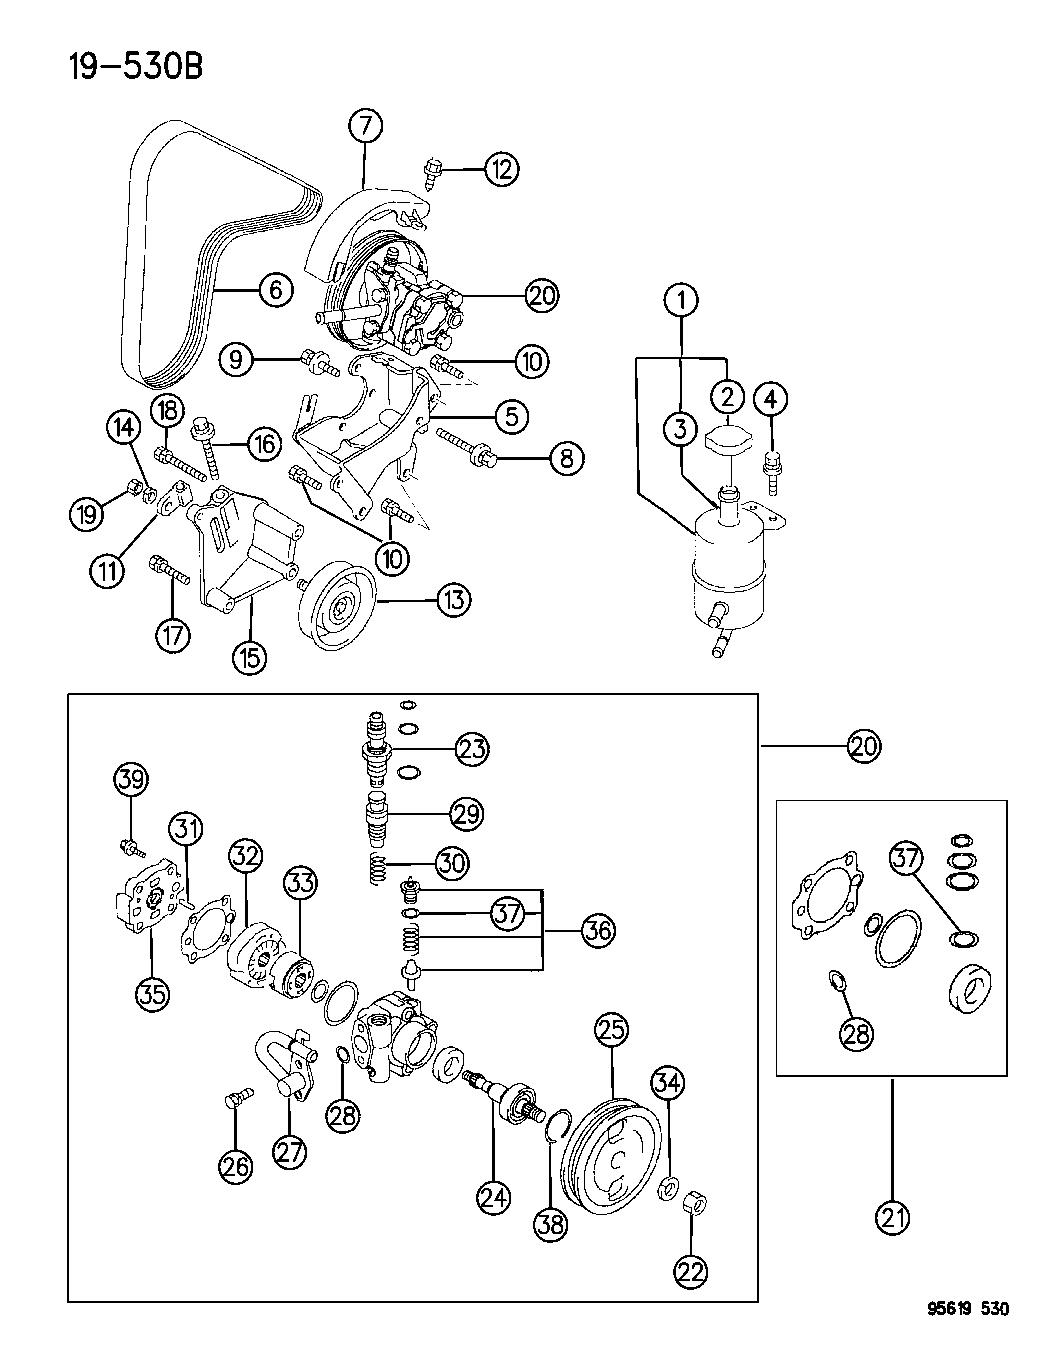 Md317370